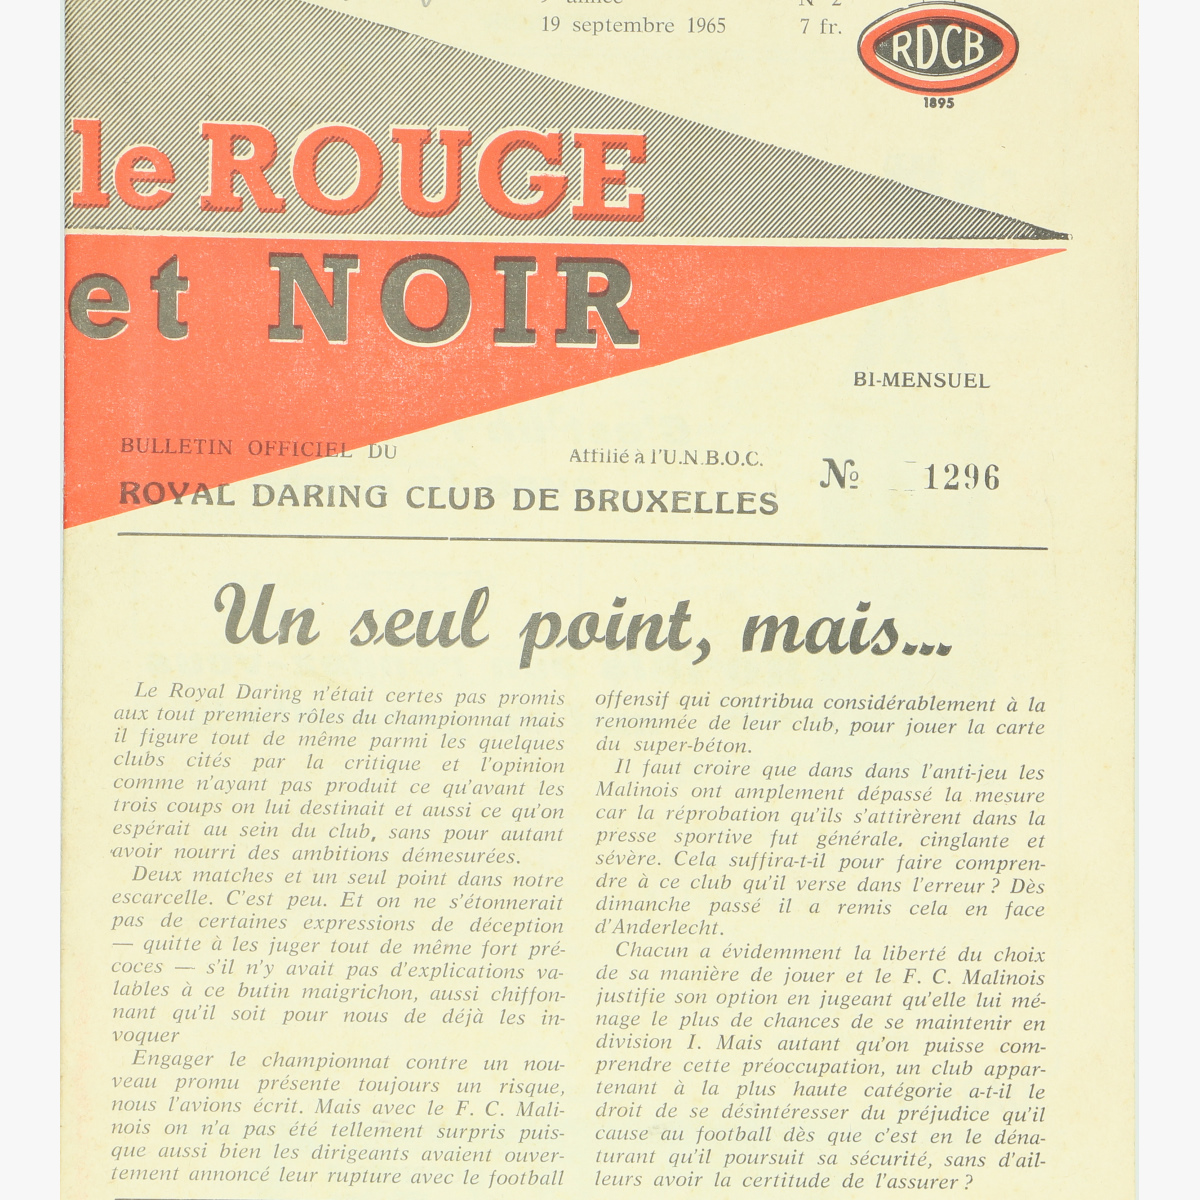 Afbeeldingen van club blad royal daring club de bruxelles 19/9/1965 nr°2